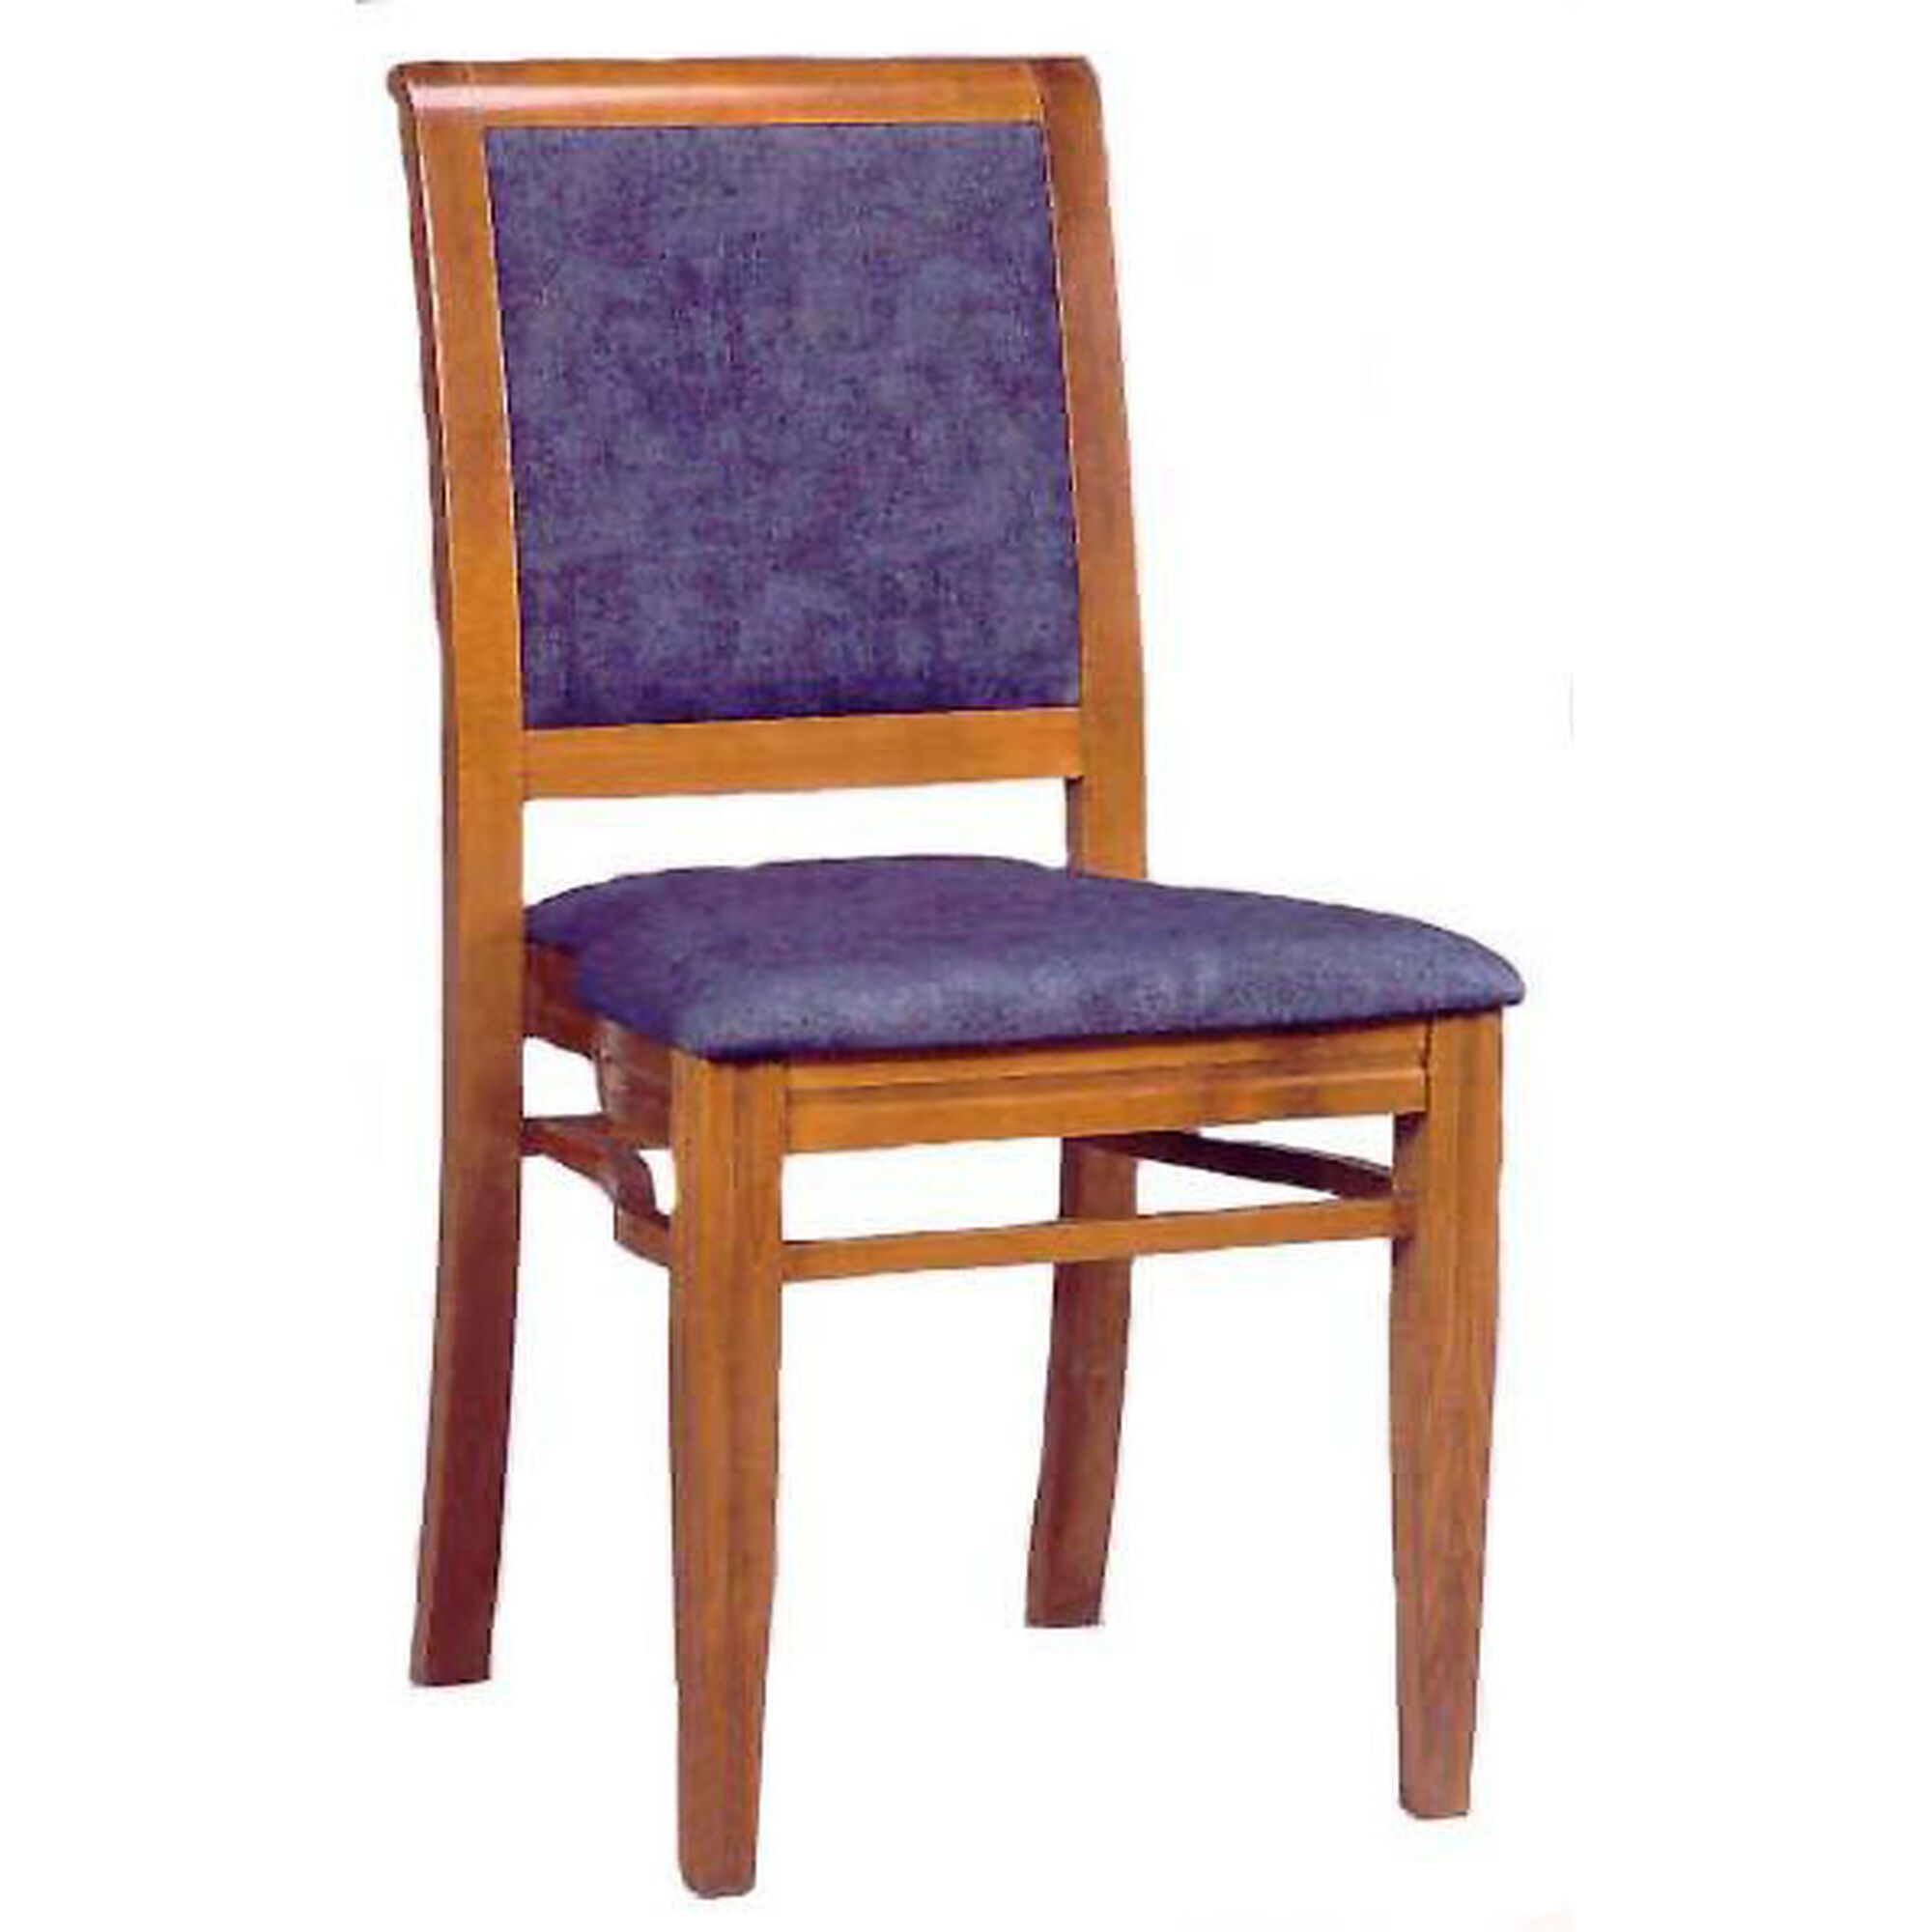 upholstered stacking guest chair 609 grade1. Black Bedroom Furniture Sets. Home Design Ideas